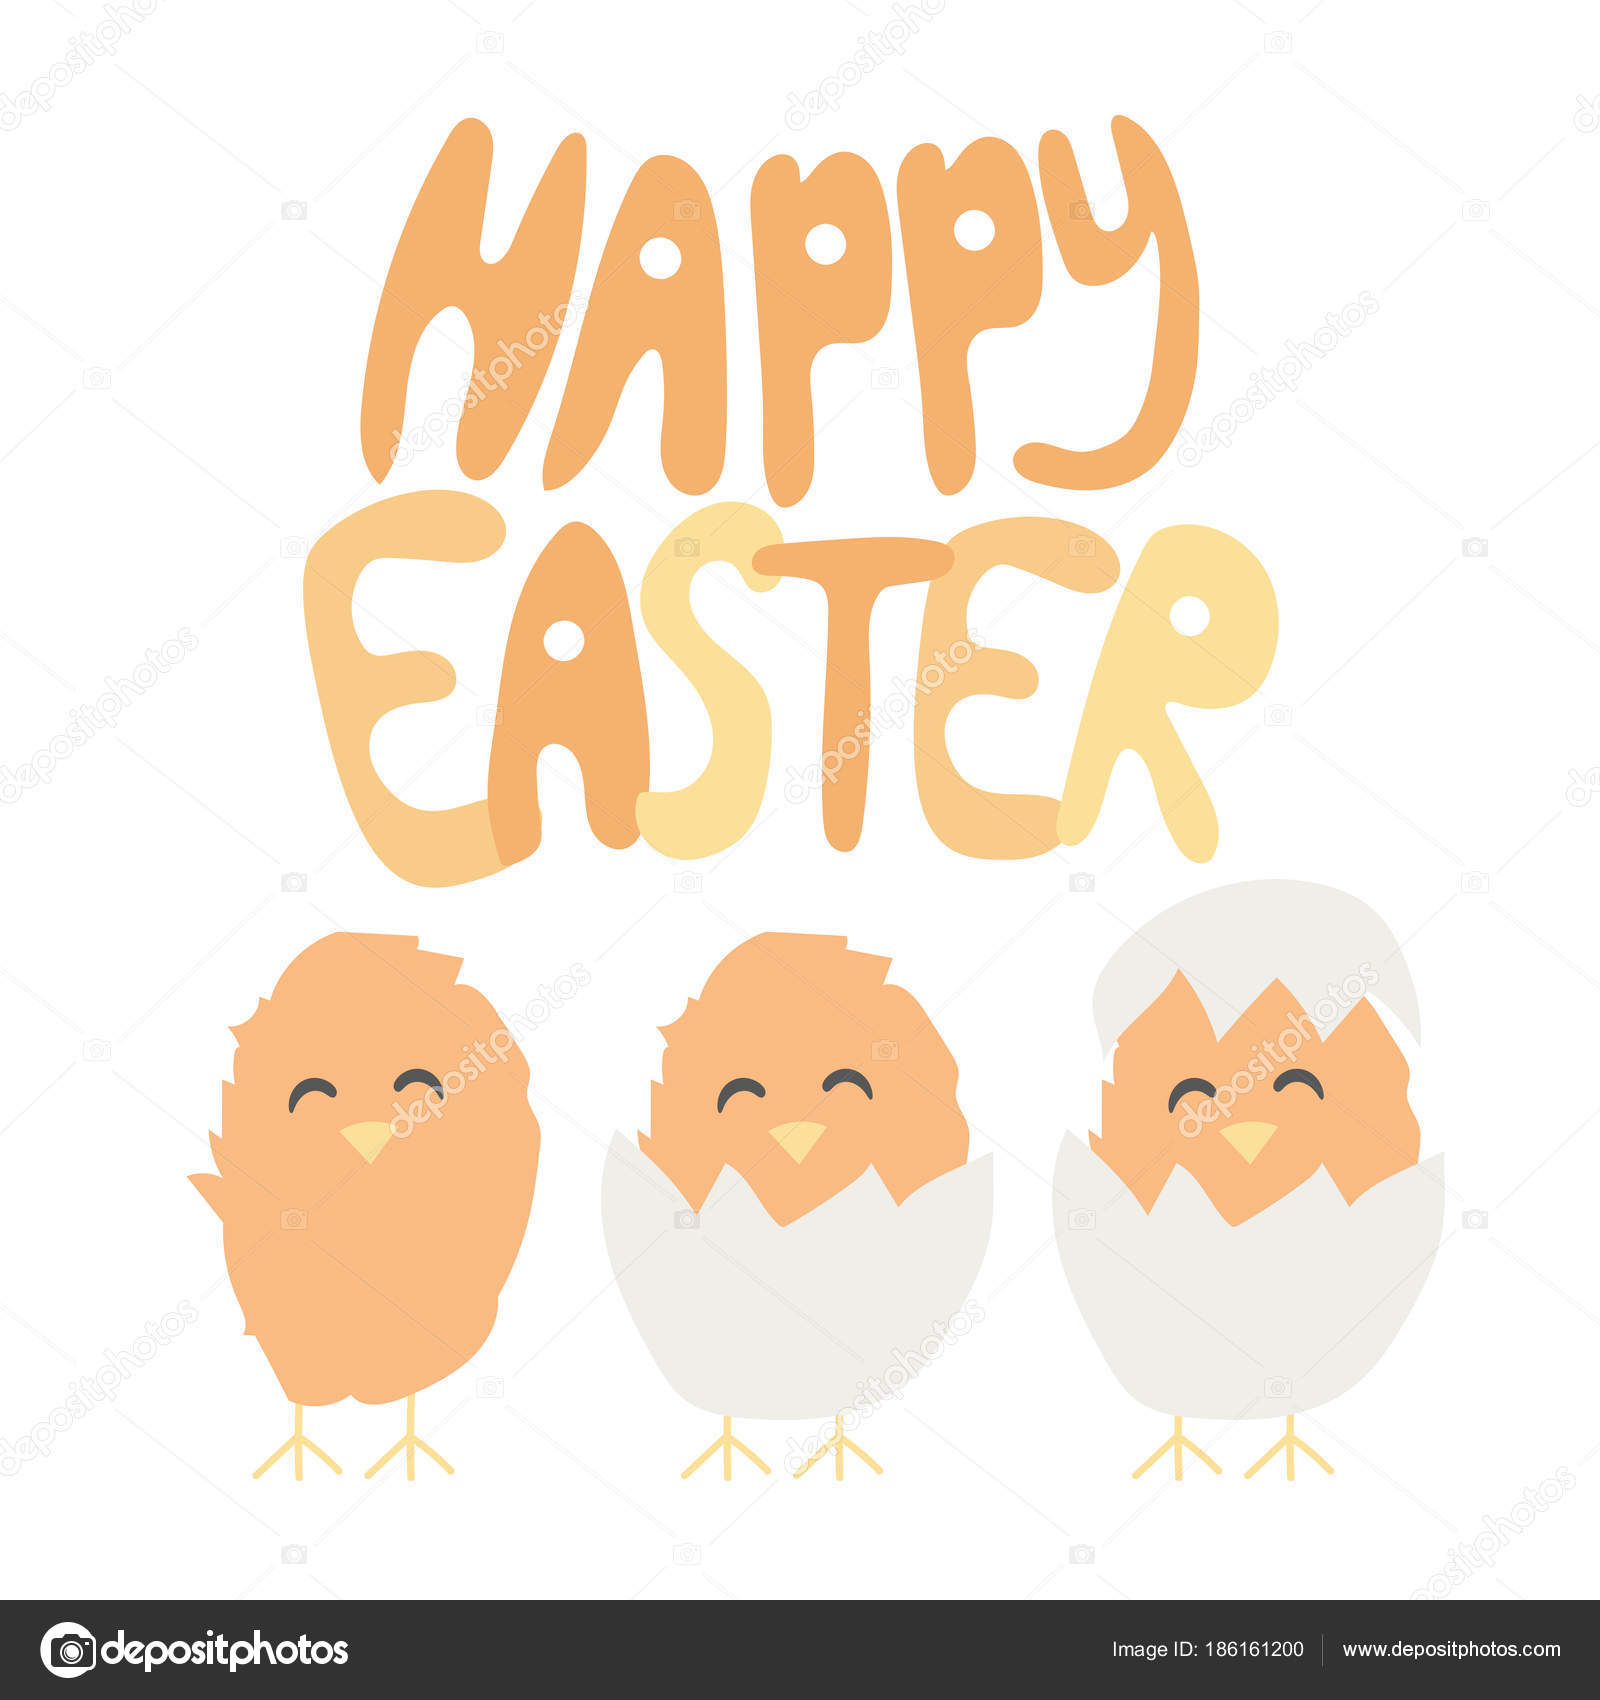 Happy easter hand written font baby chiken hatched from an egg happy easter hand written font baby chiken hatched from an egg greeting card m4hsunfo